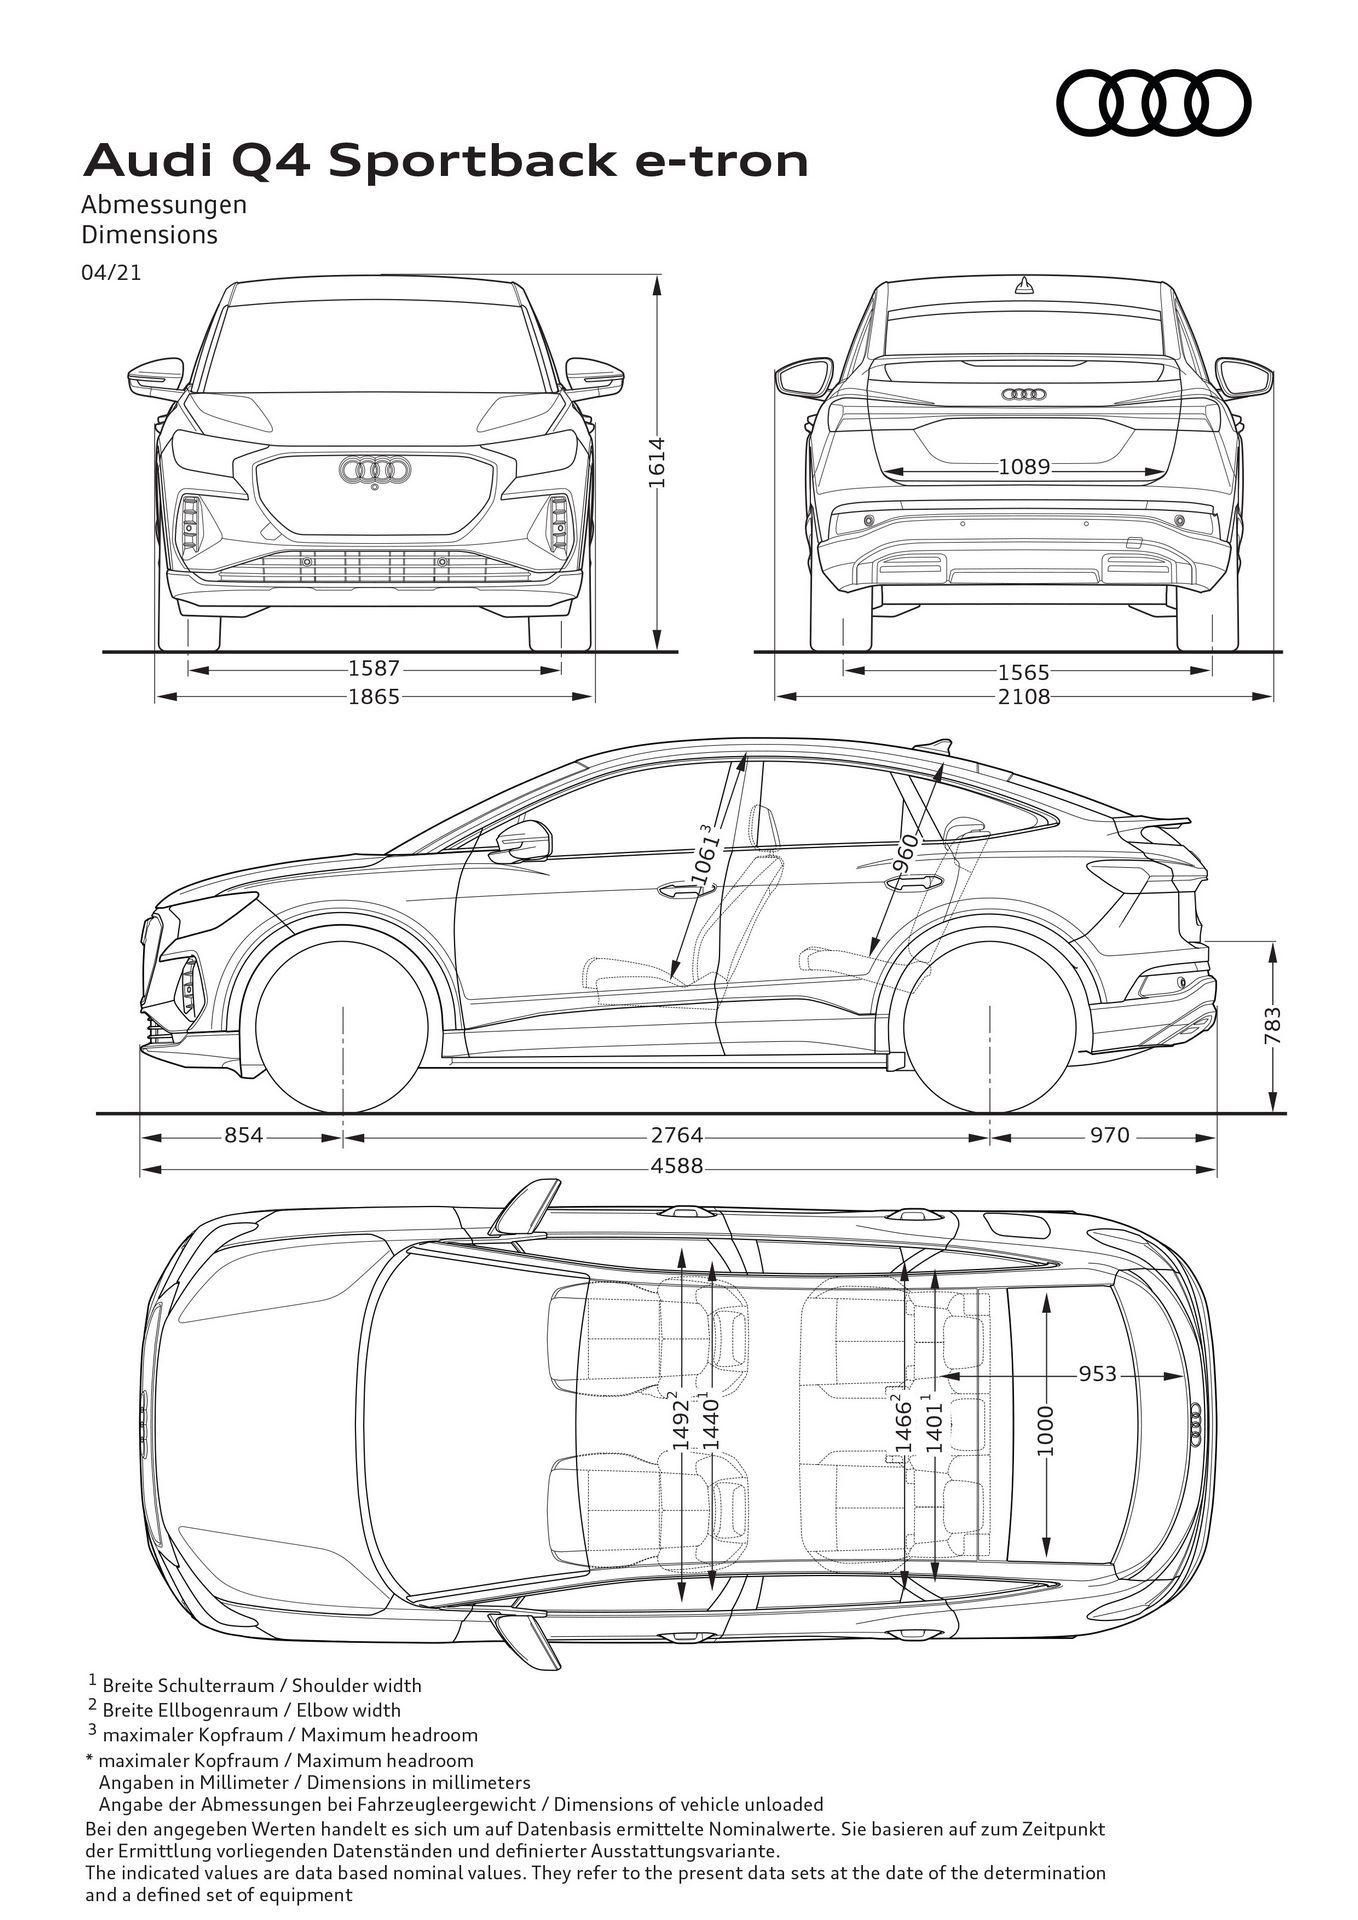 Audi-Q4-e-tron-and-Q4-e-tron-Sportback-135